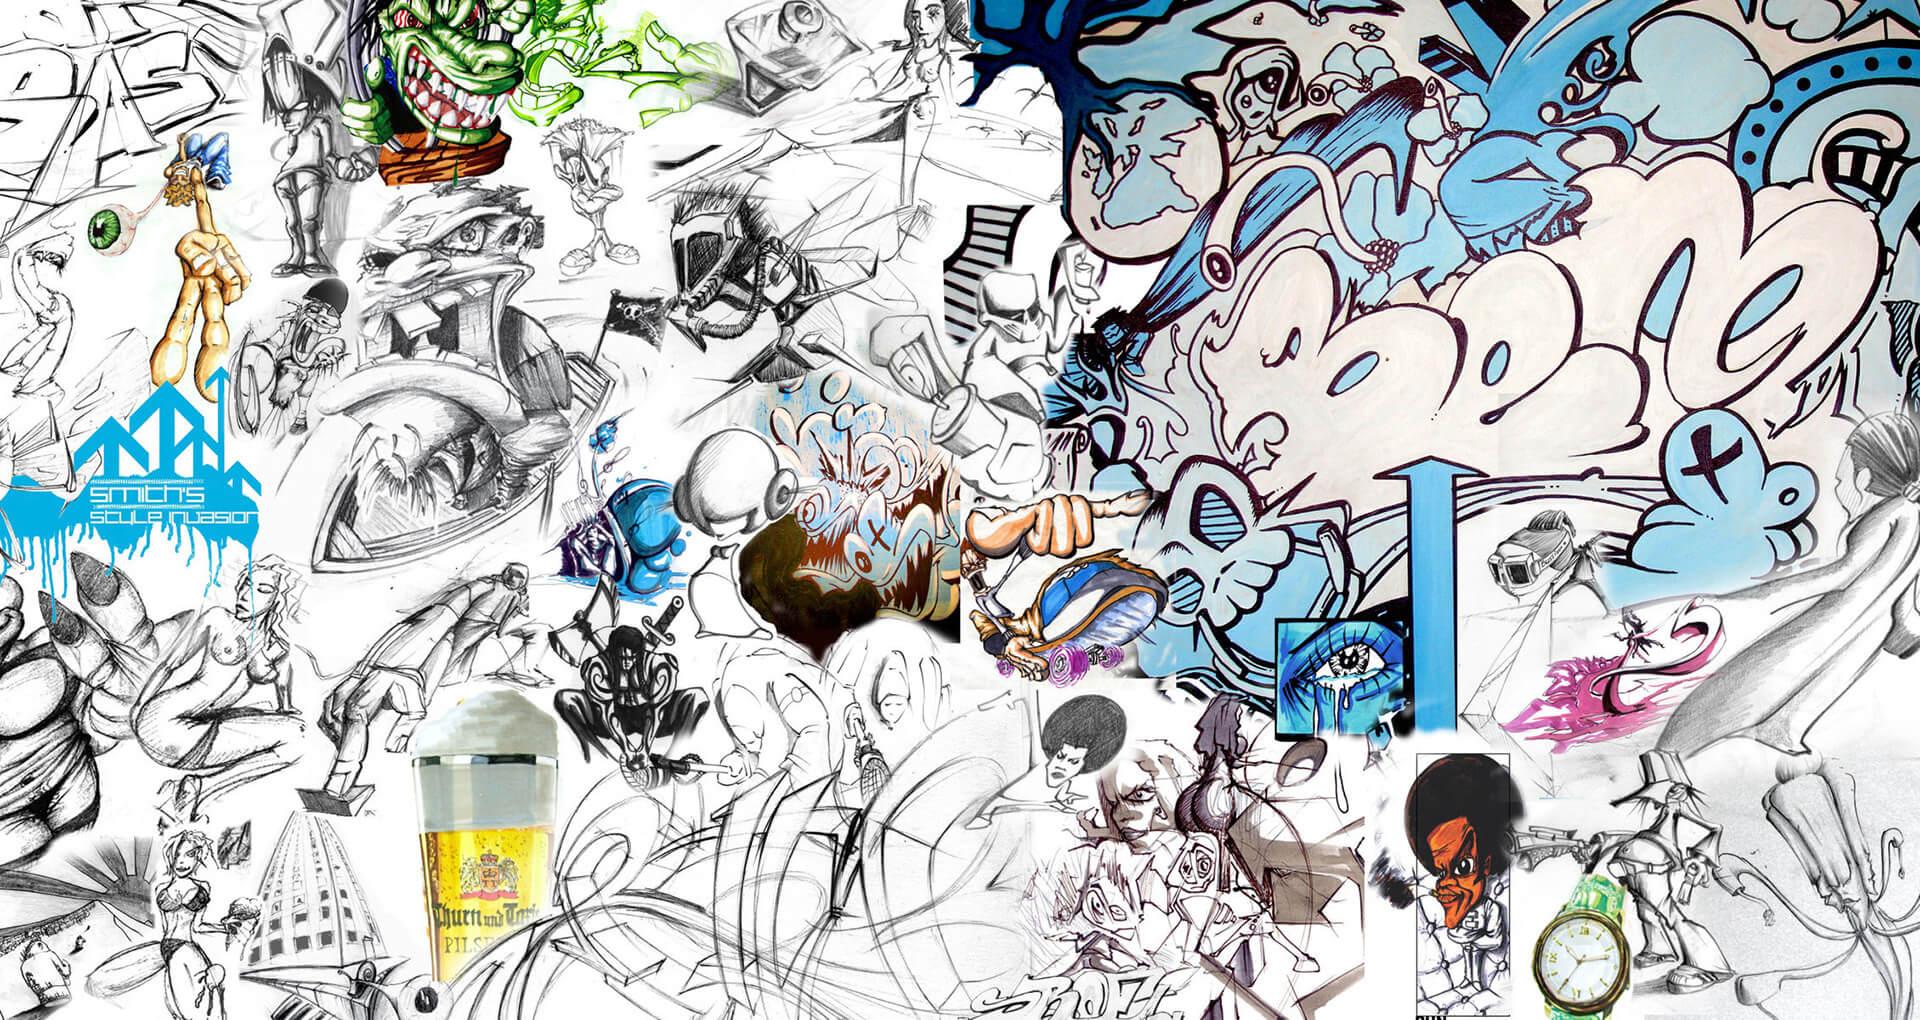 art paintings illustrations graphic gregor fenger 6